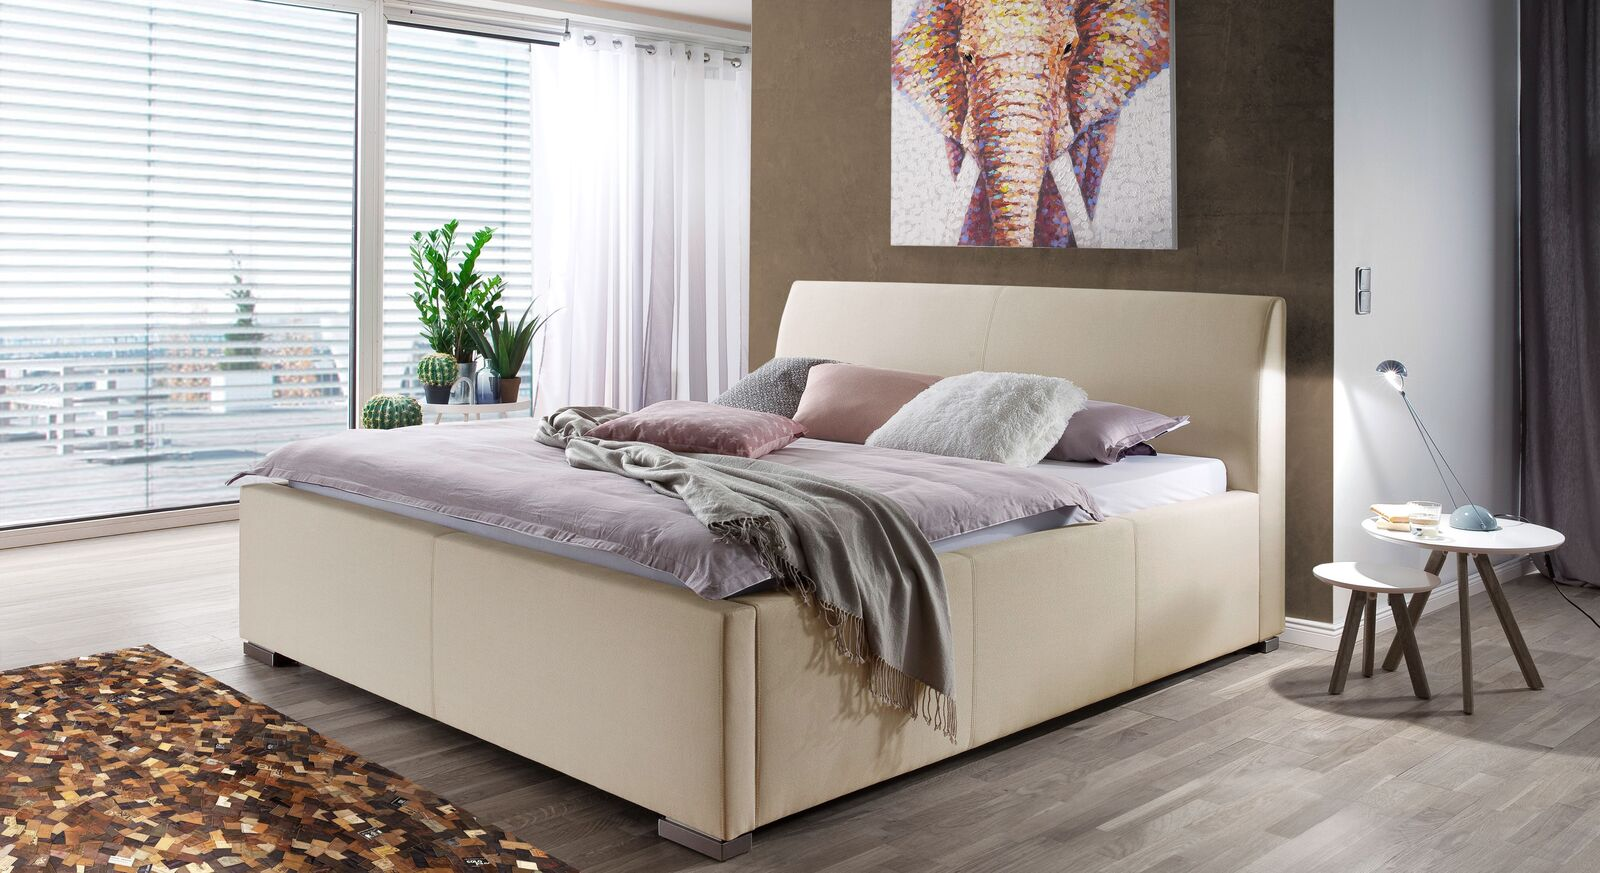 Passende Produkte zum Bett Sesimbra